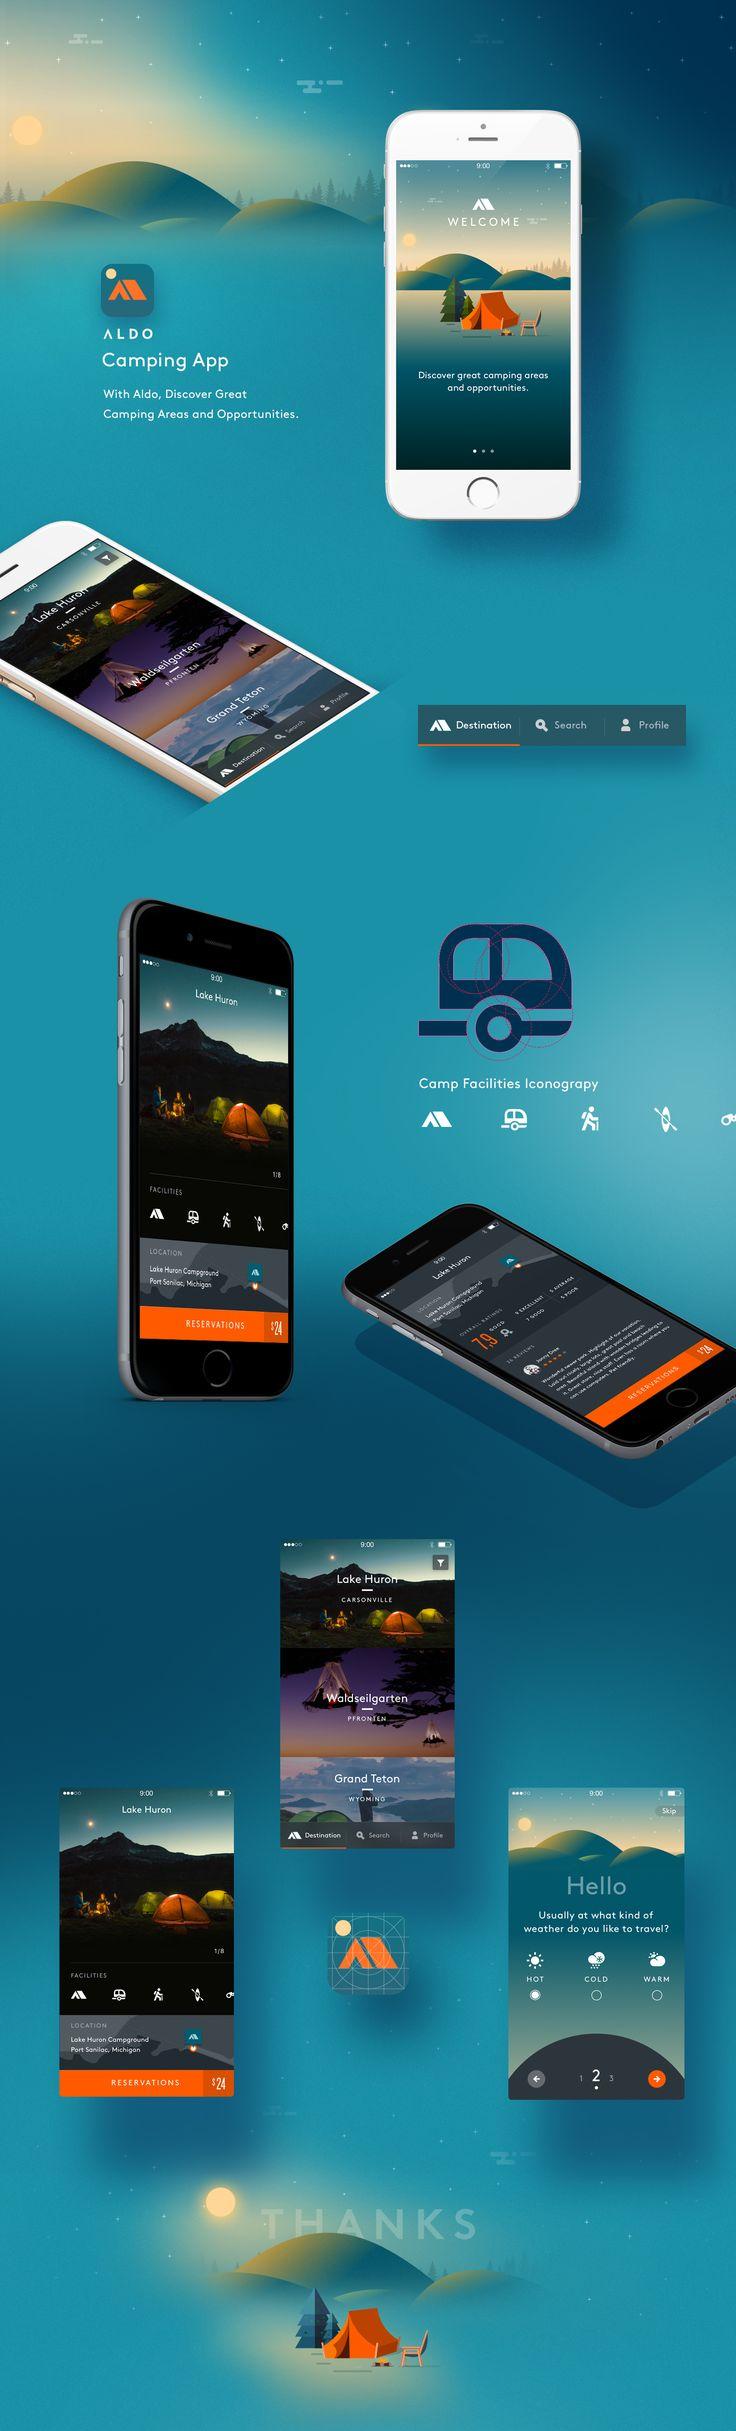 Bekijk dit @Behance-project: \u201cCamping App\u201d https://www.behance.net/gallery/36177587/Camping-App